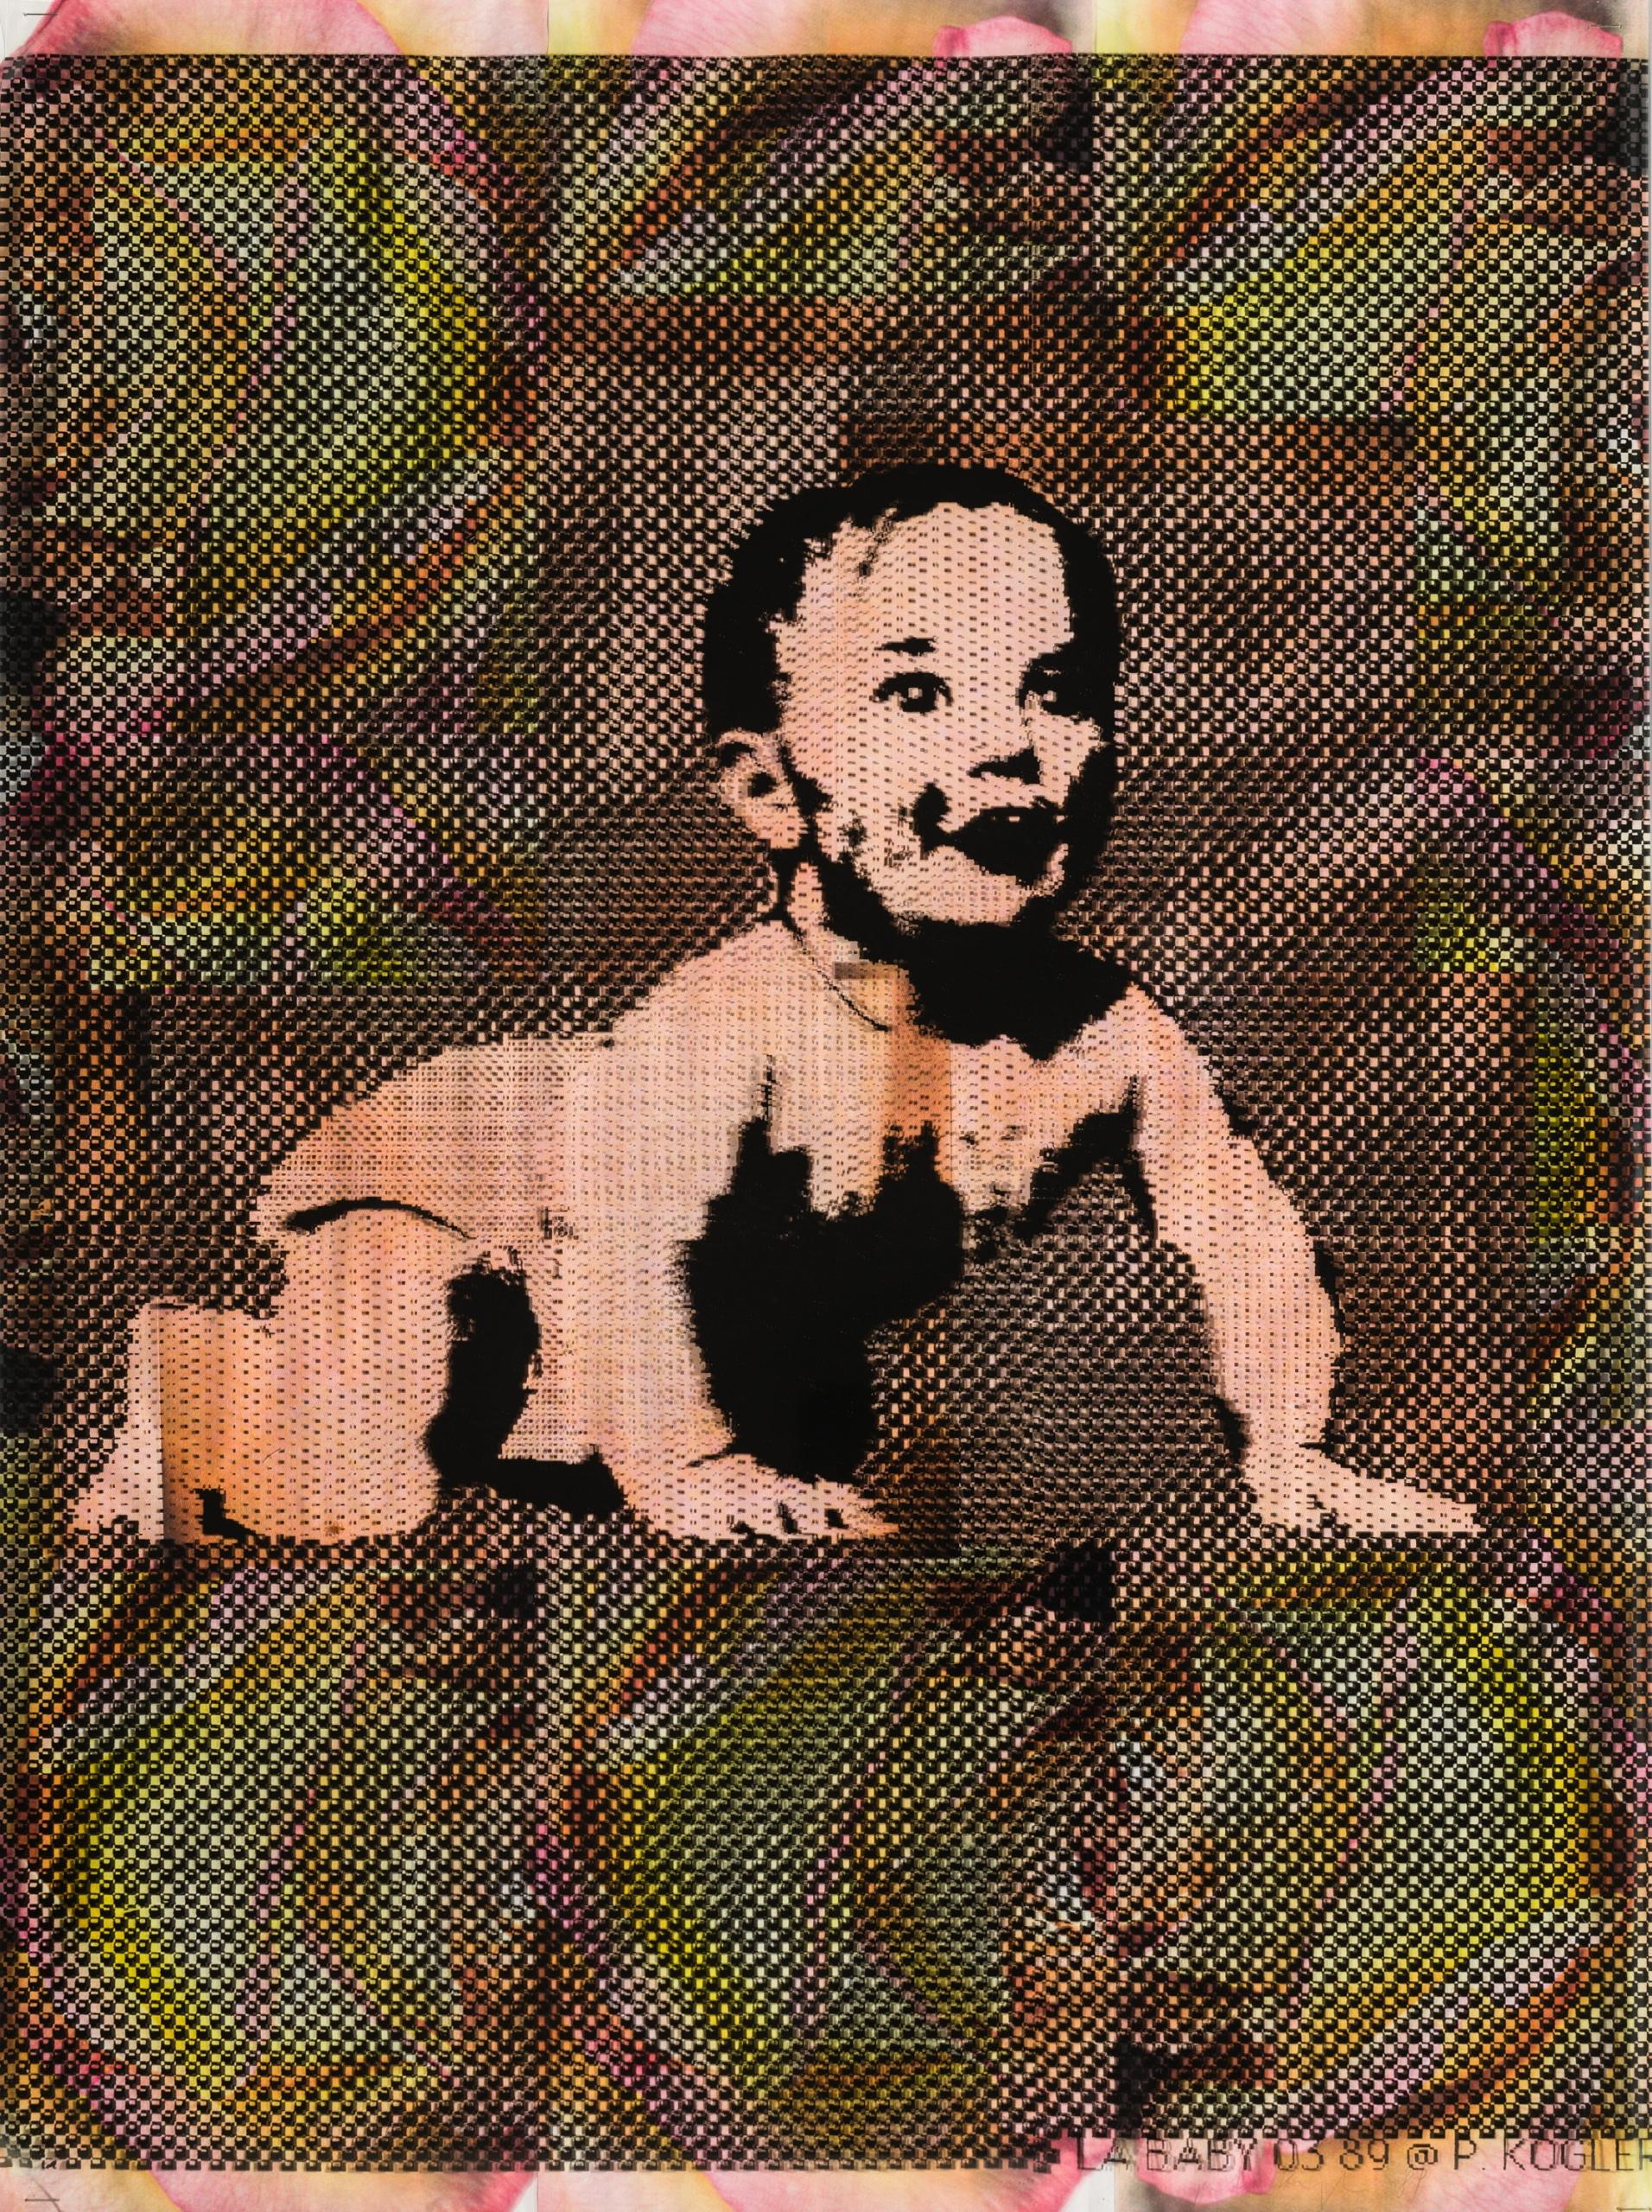 Peter Kogler, LA Baby